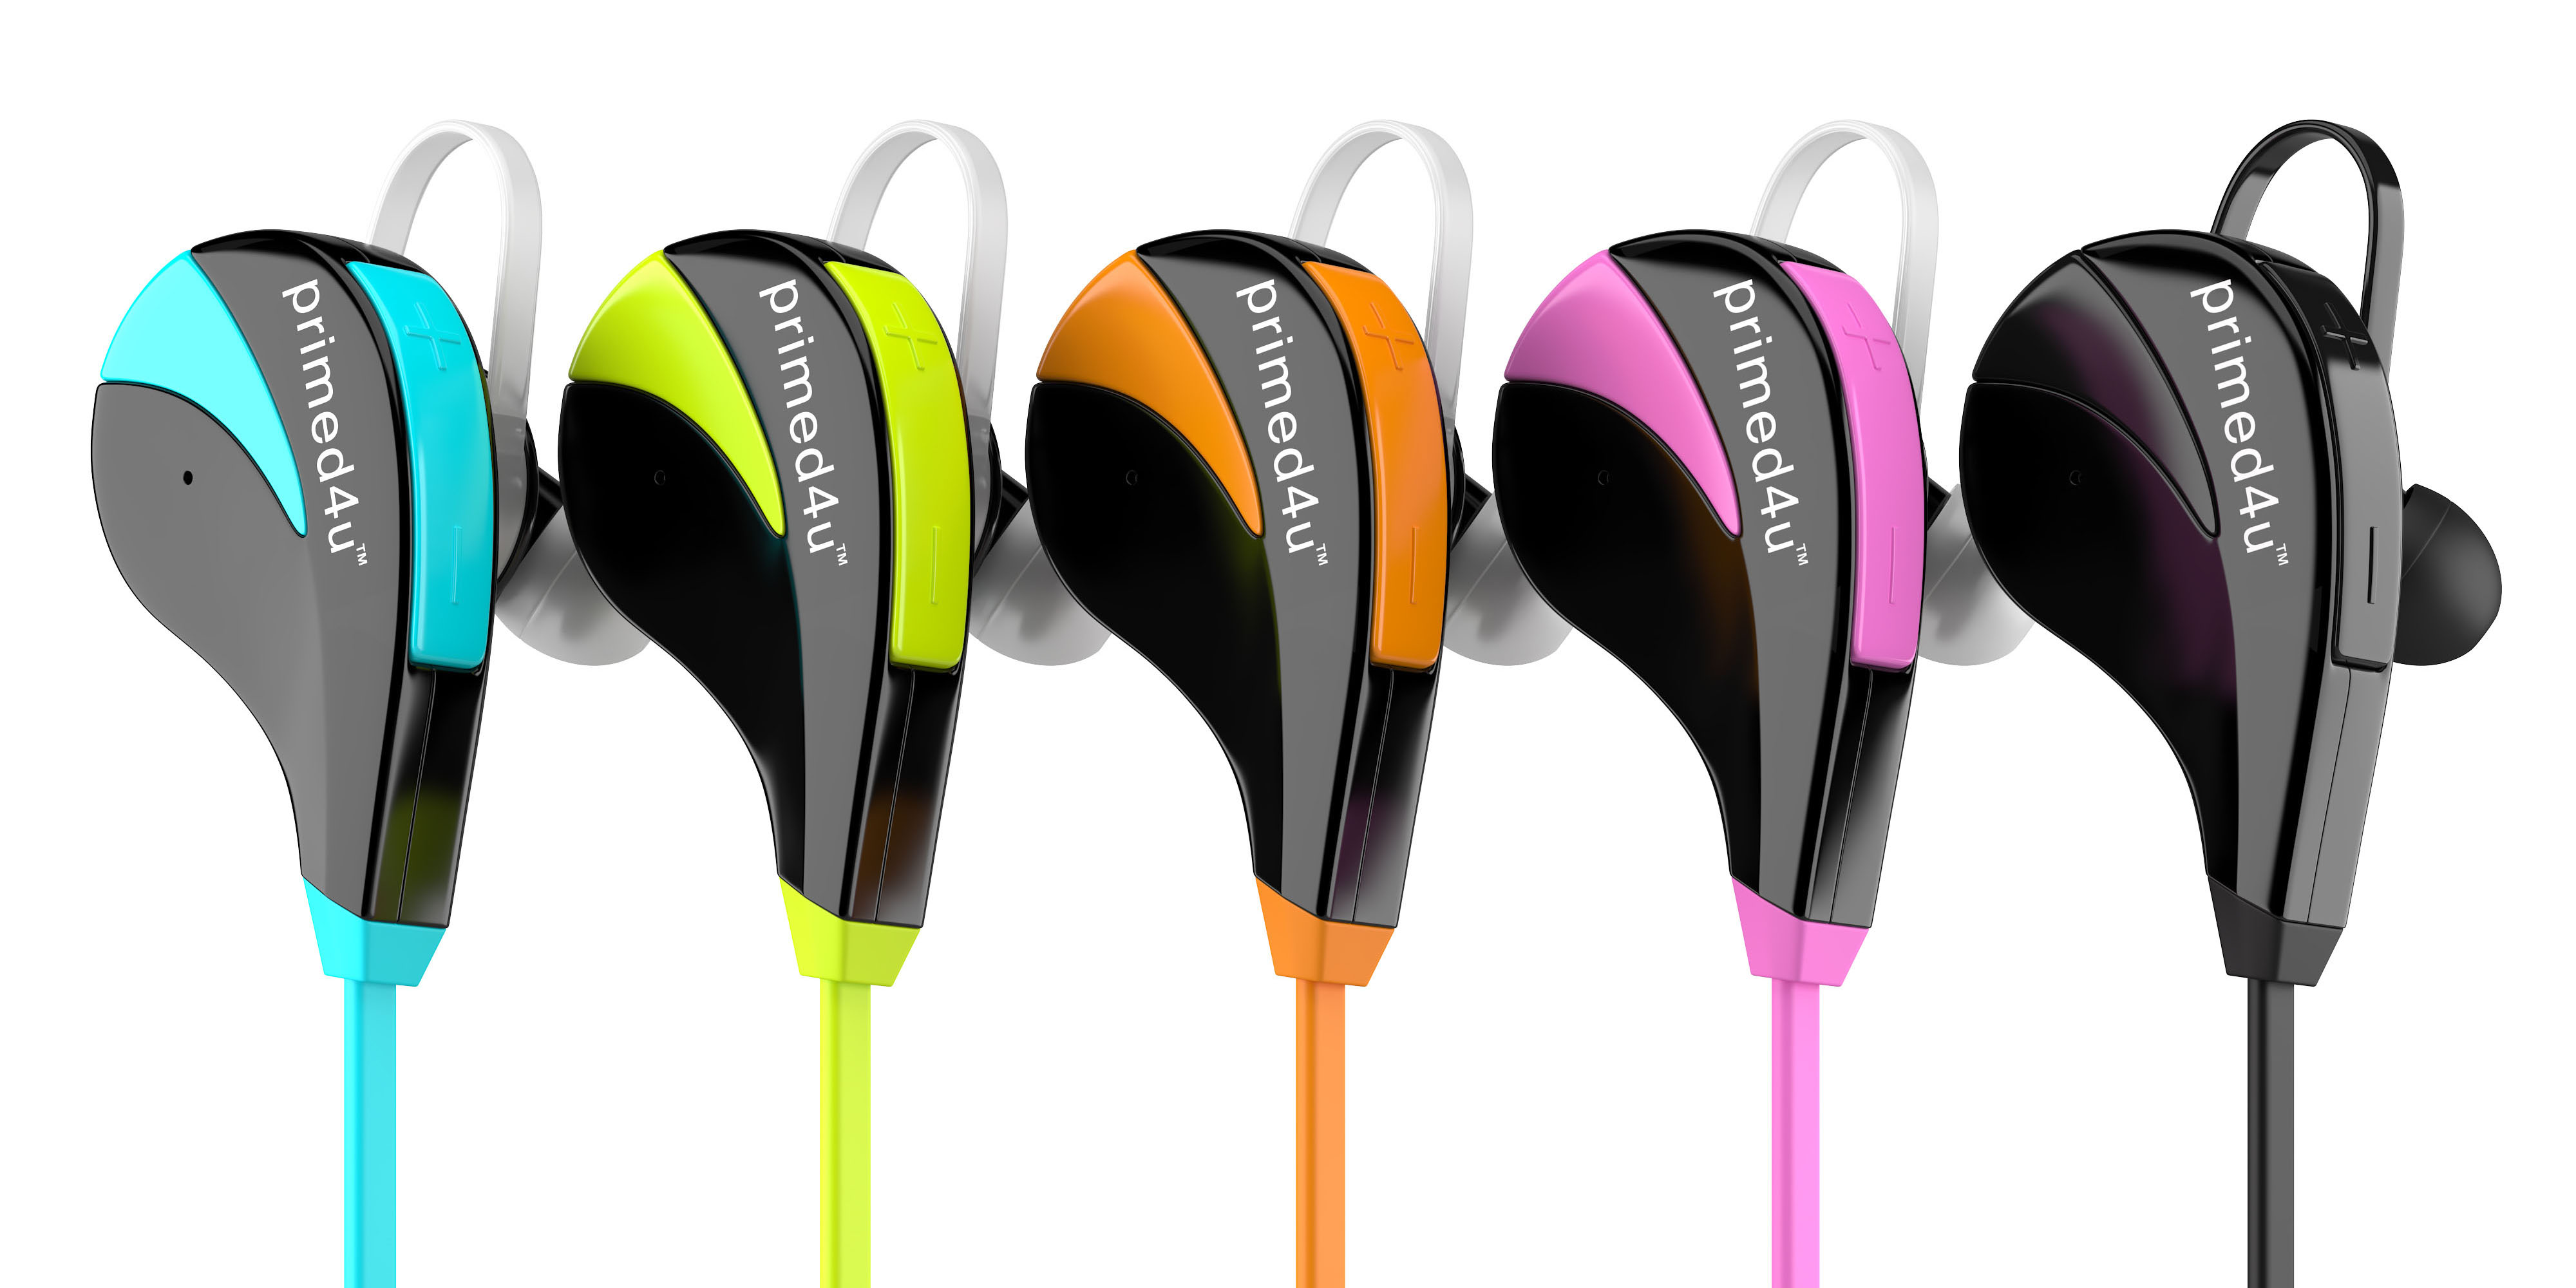 Primed4U headphones lined up in blue, green, orange, purple, and black colors